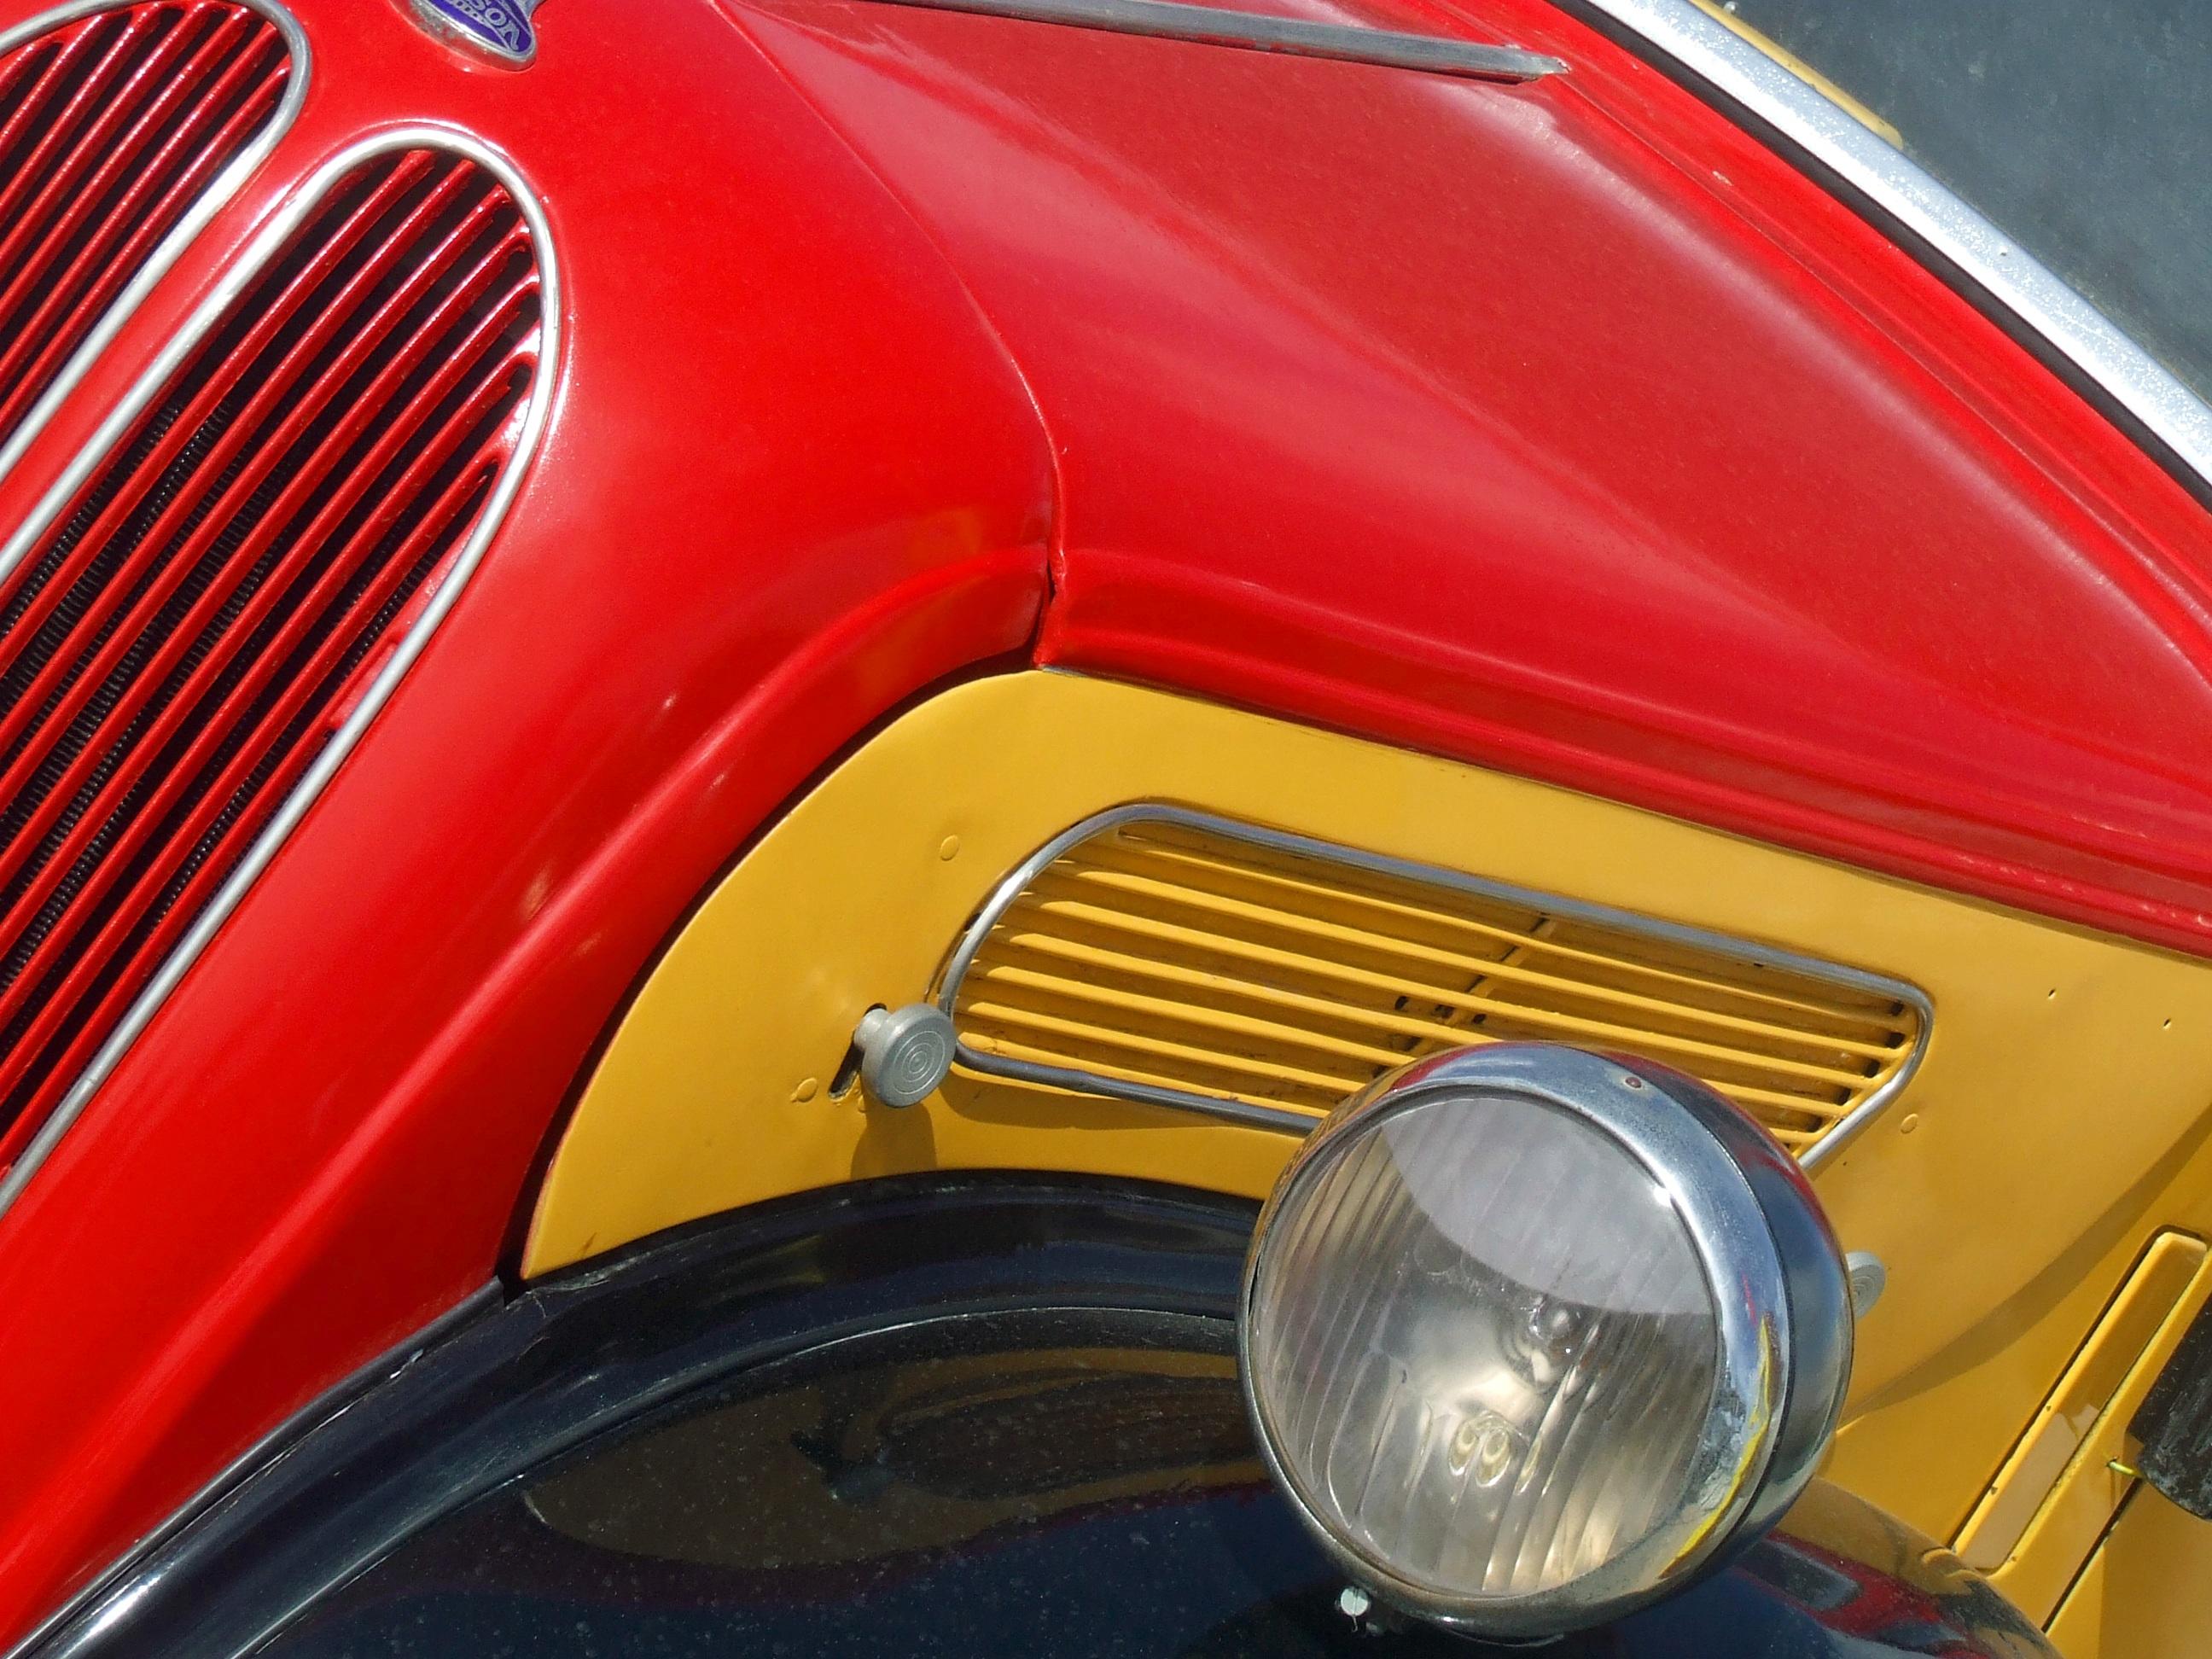 Free Images : abstract, wheel, retro, transportation, transport ...